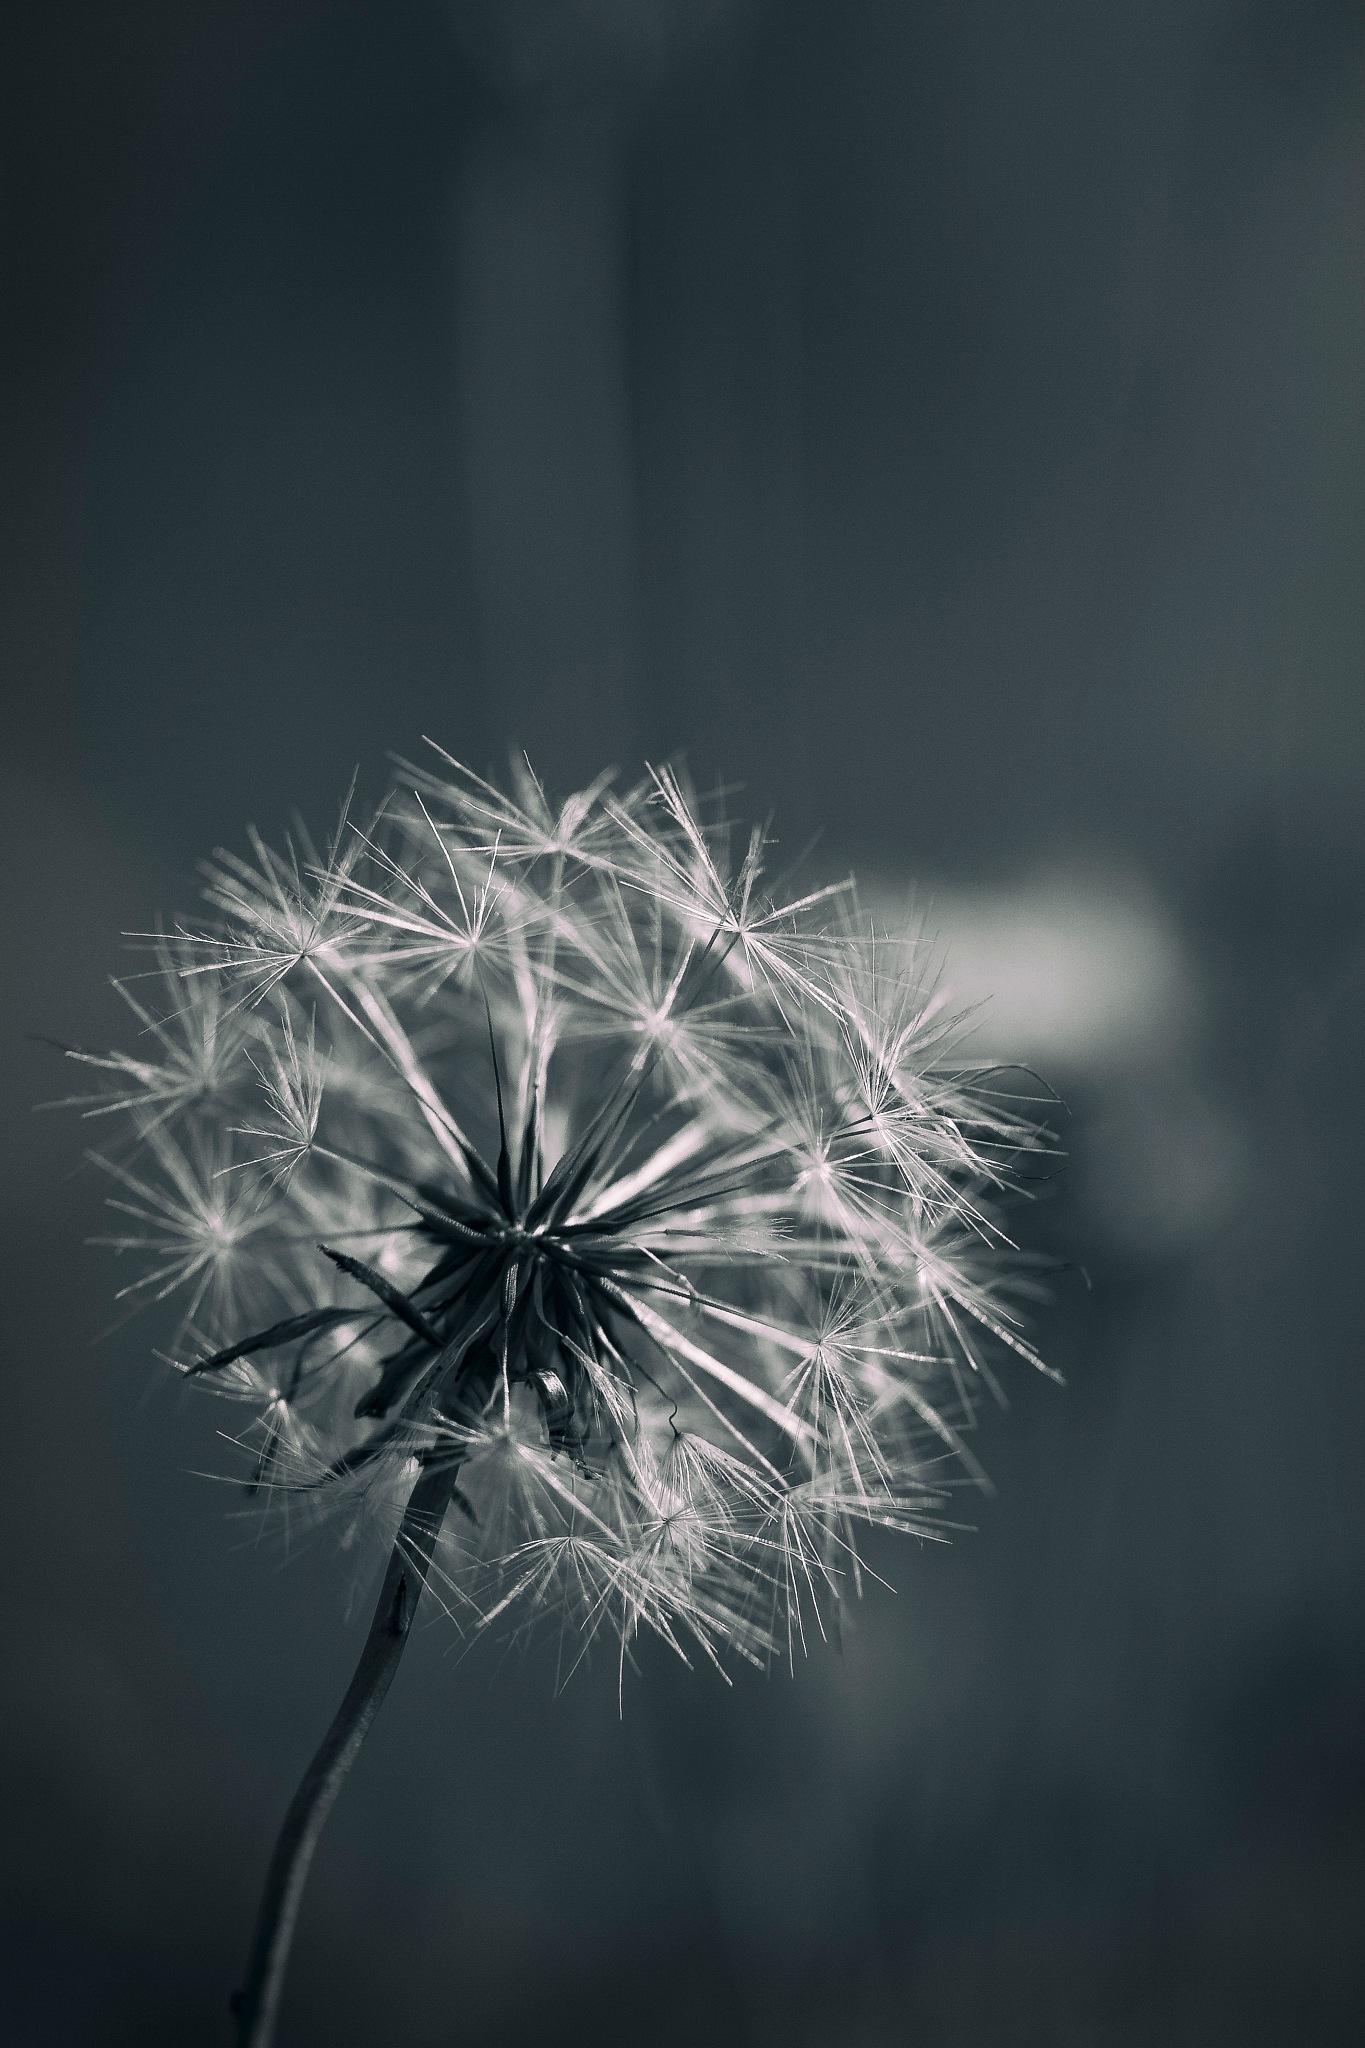 Twilight Dandelion by Steven Ritchie